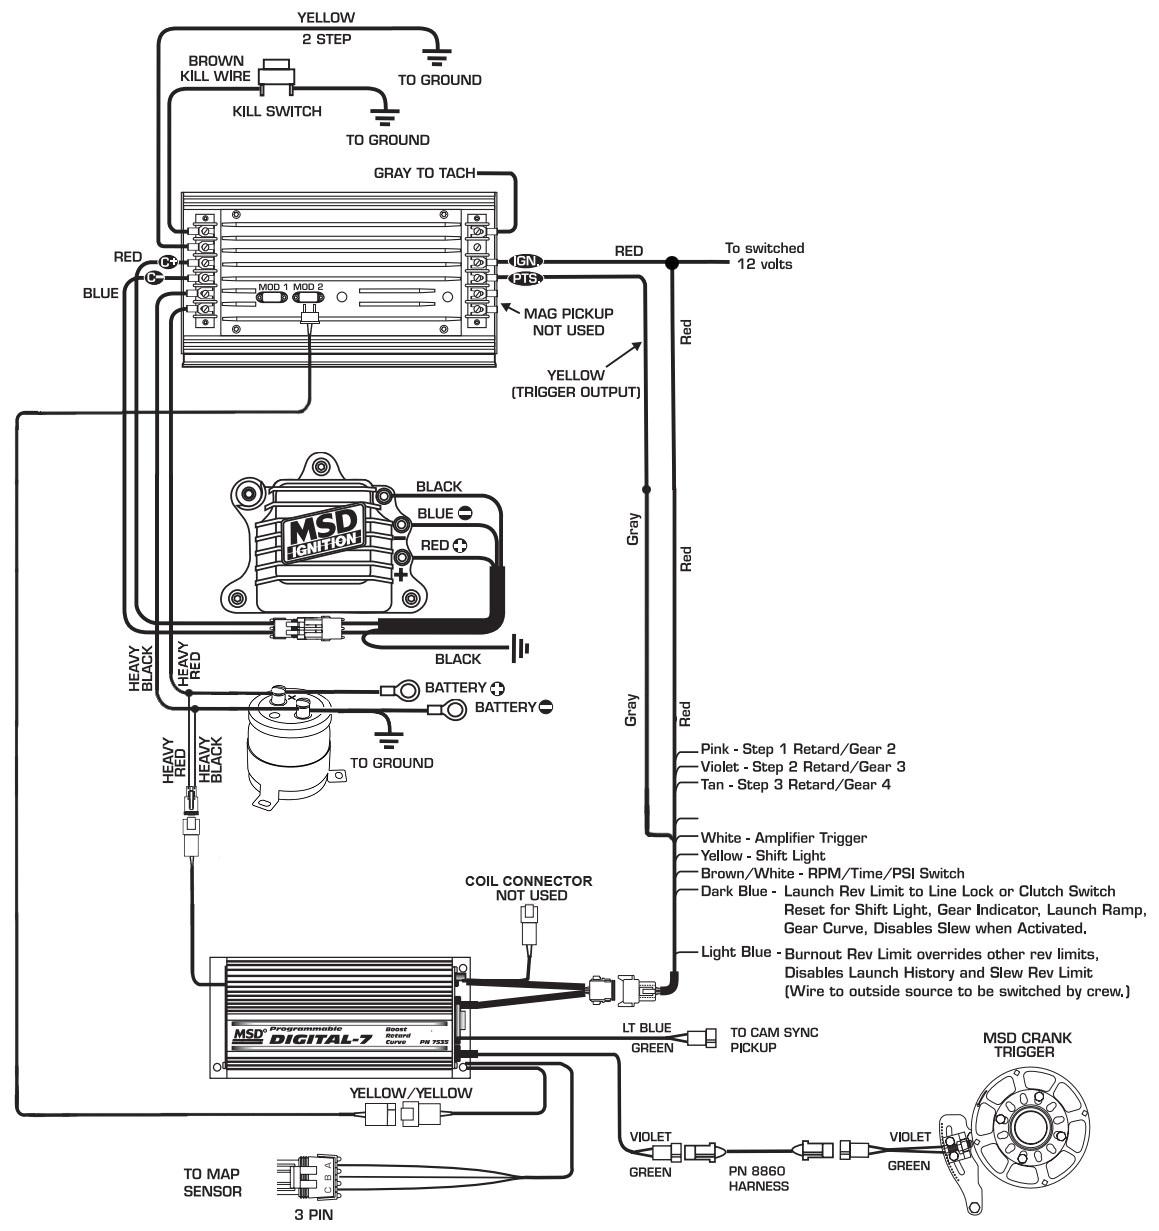 msd module wiring diagram wiring diagram centre msd rpm module wire diagram 3 stage